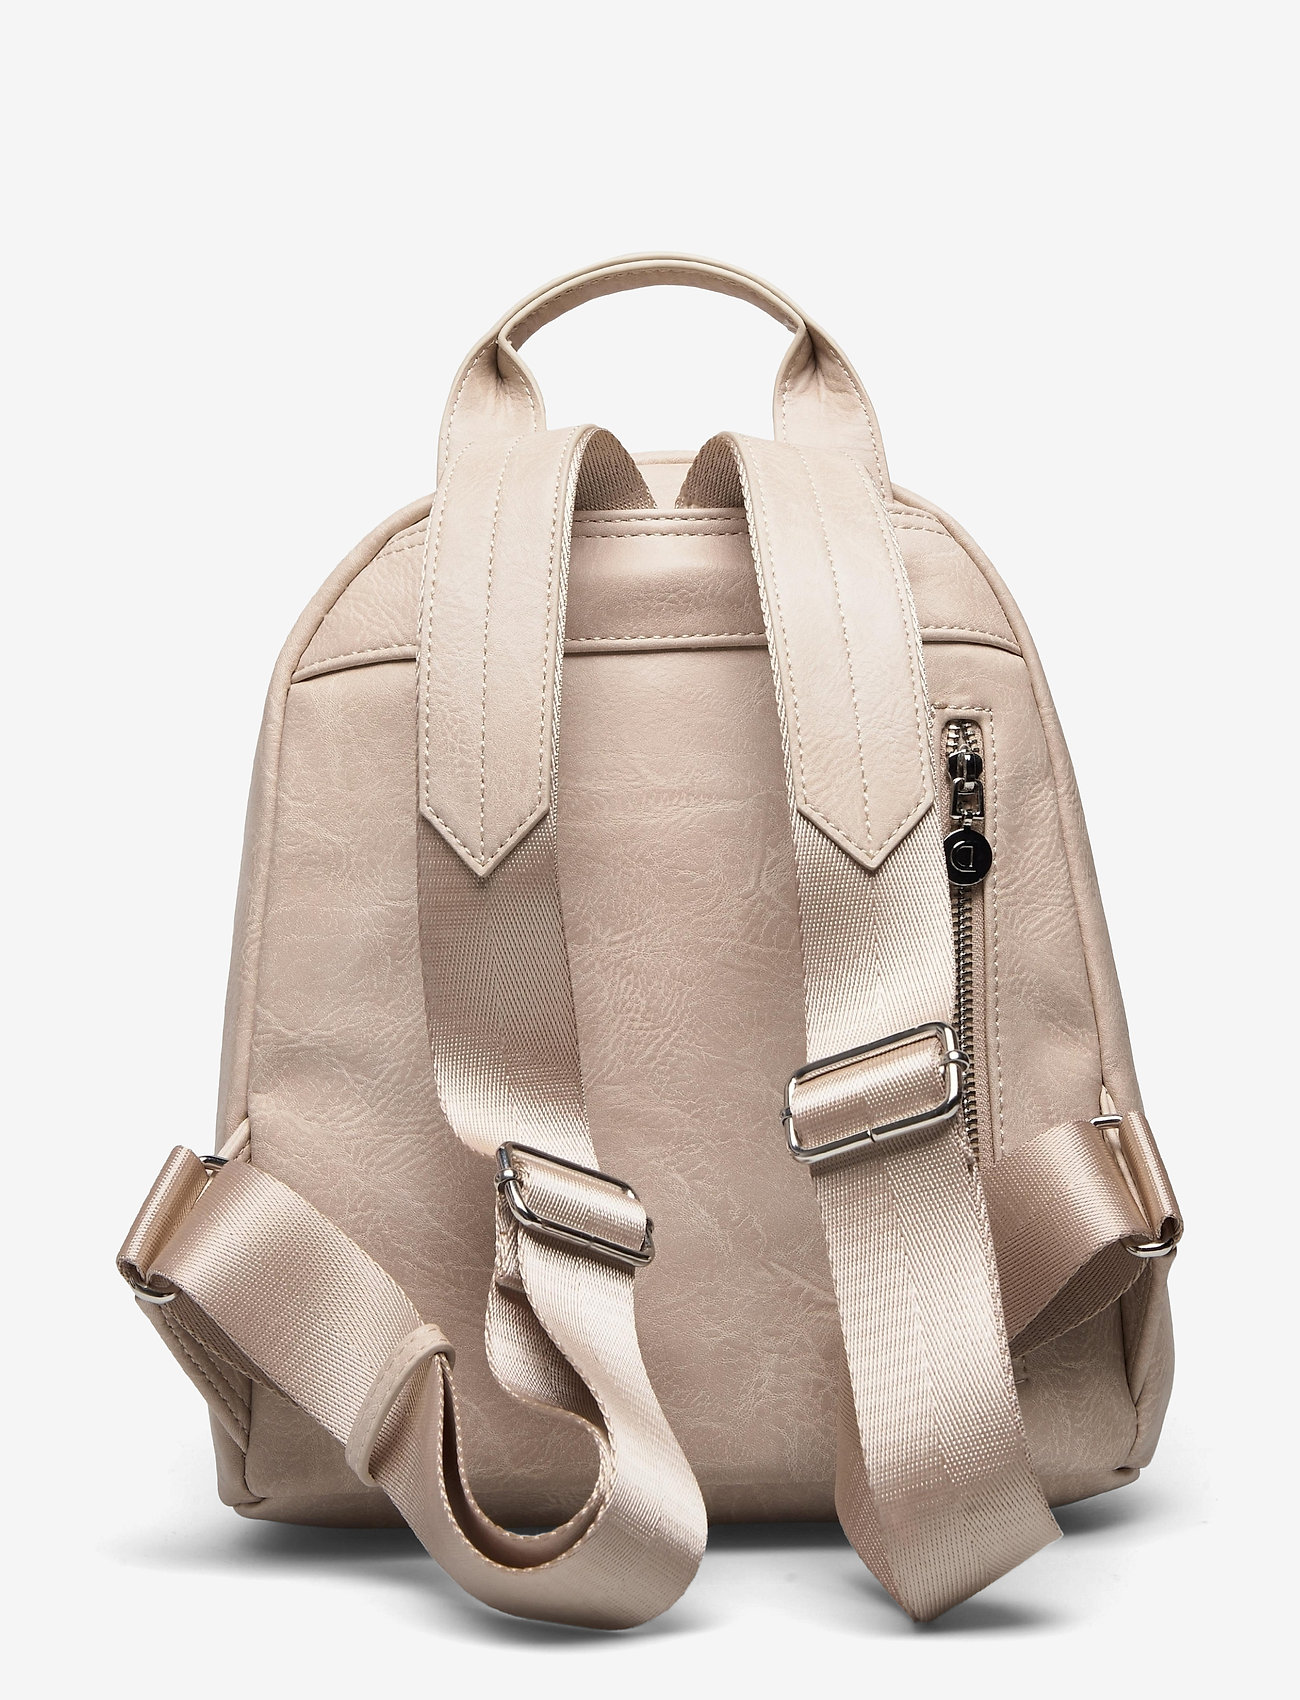 Desigual Accessories - BACK CARLINA NAZCA MINI - ryggsäckar - crema - 1